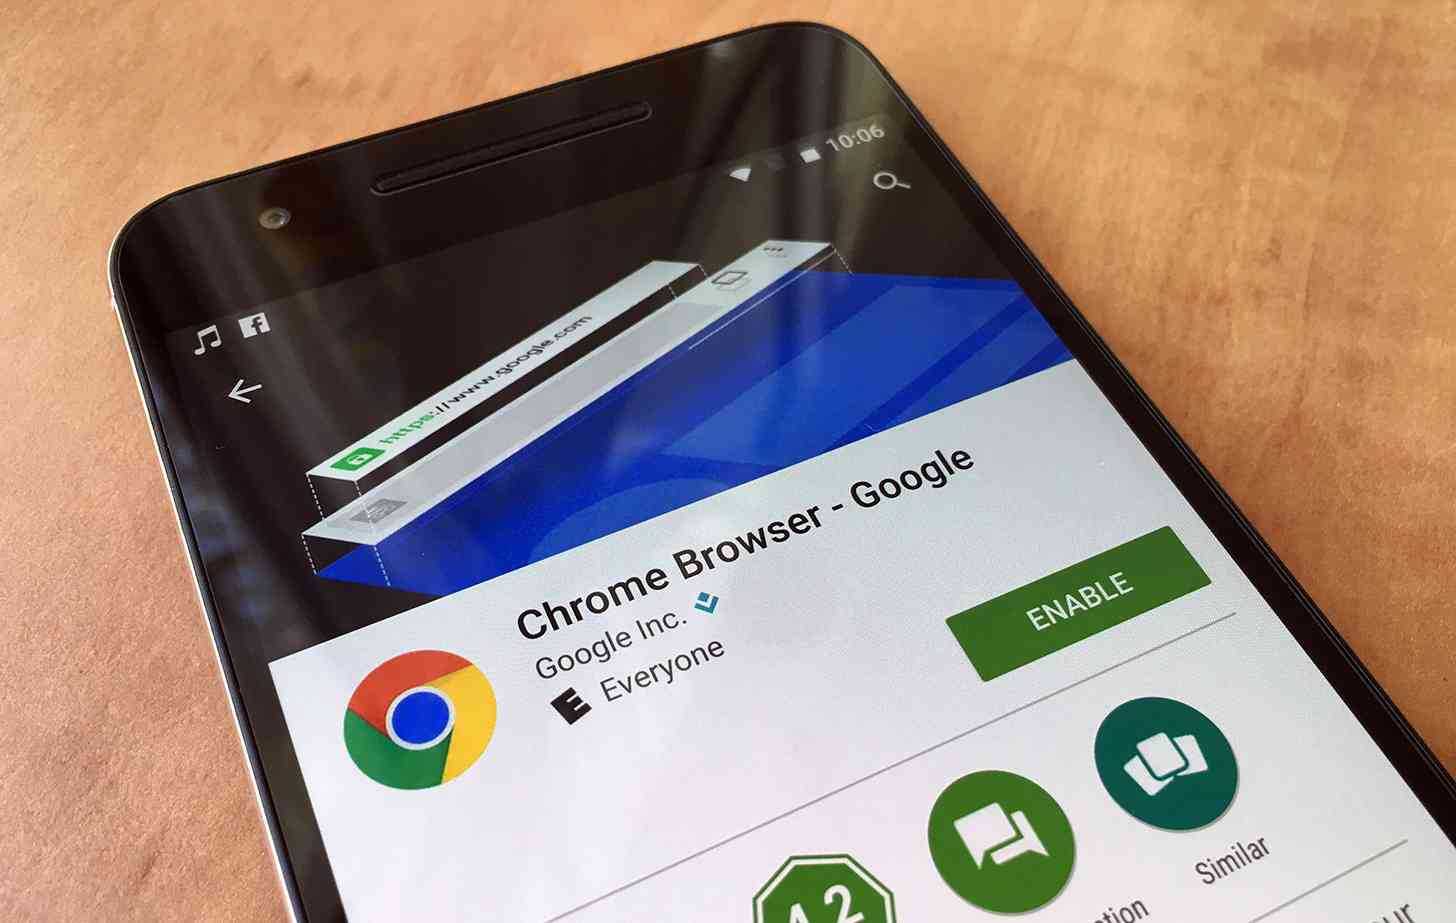 Google Chrome Android app